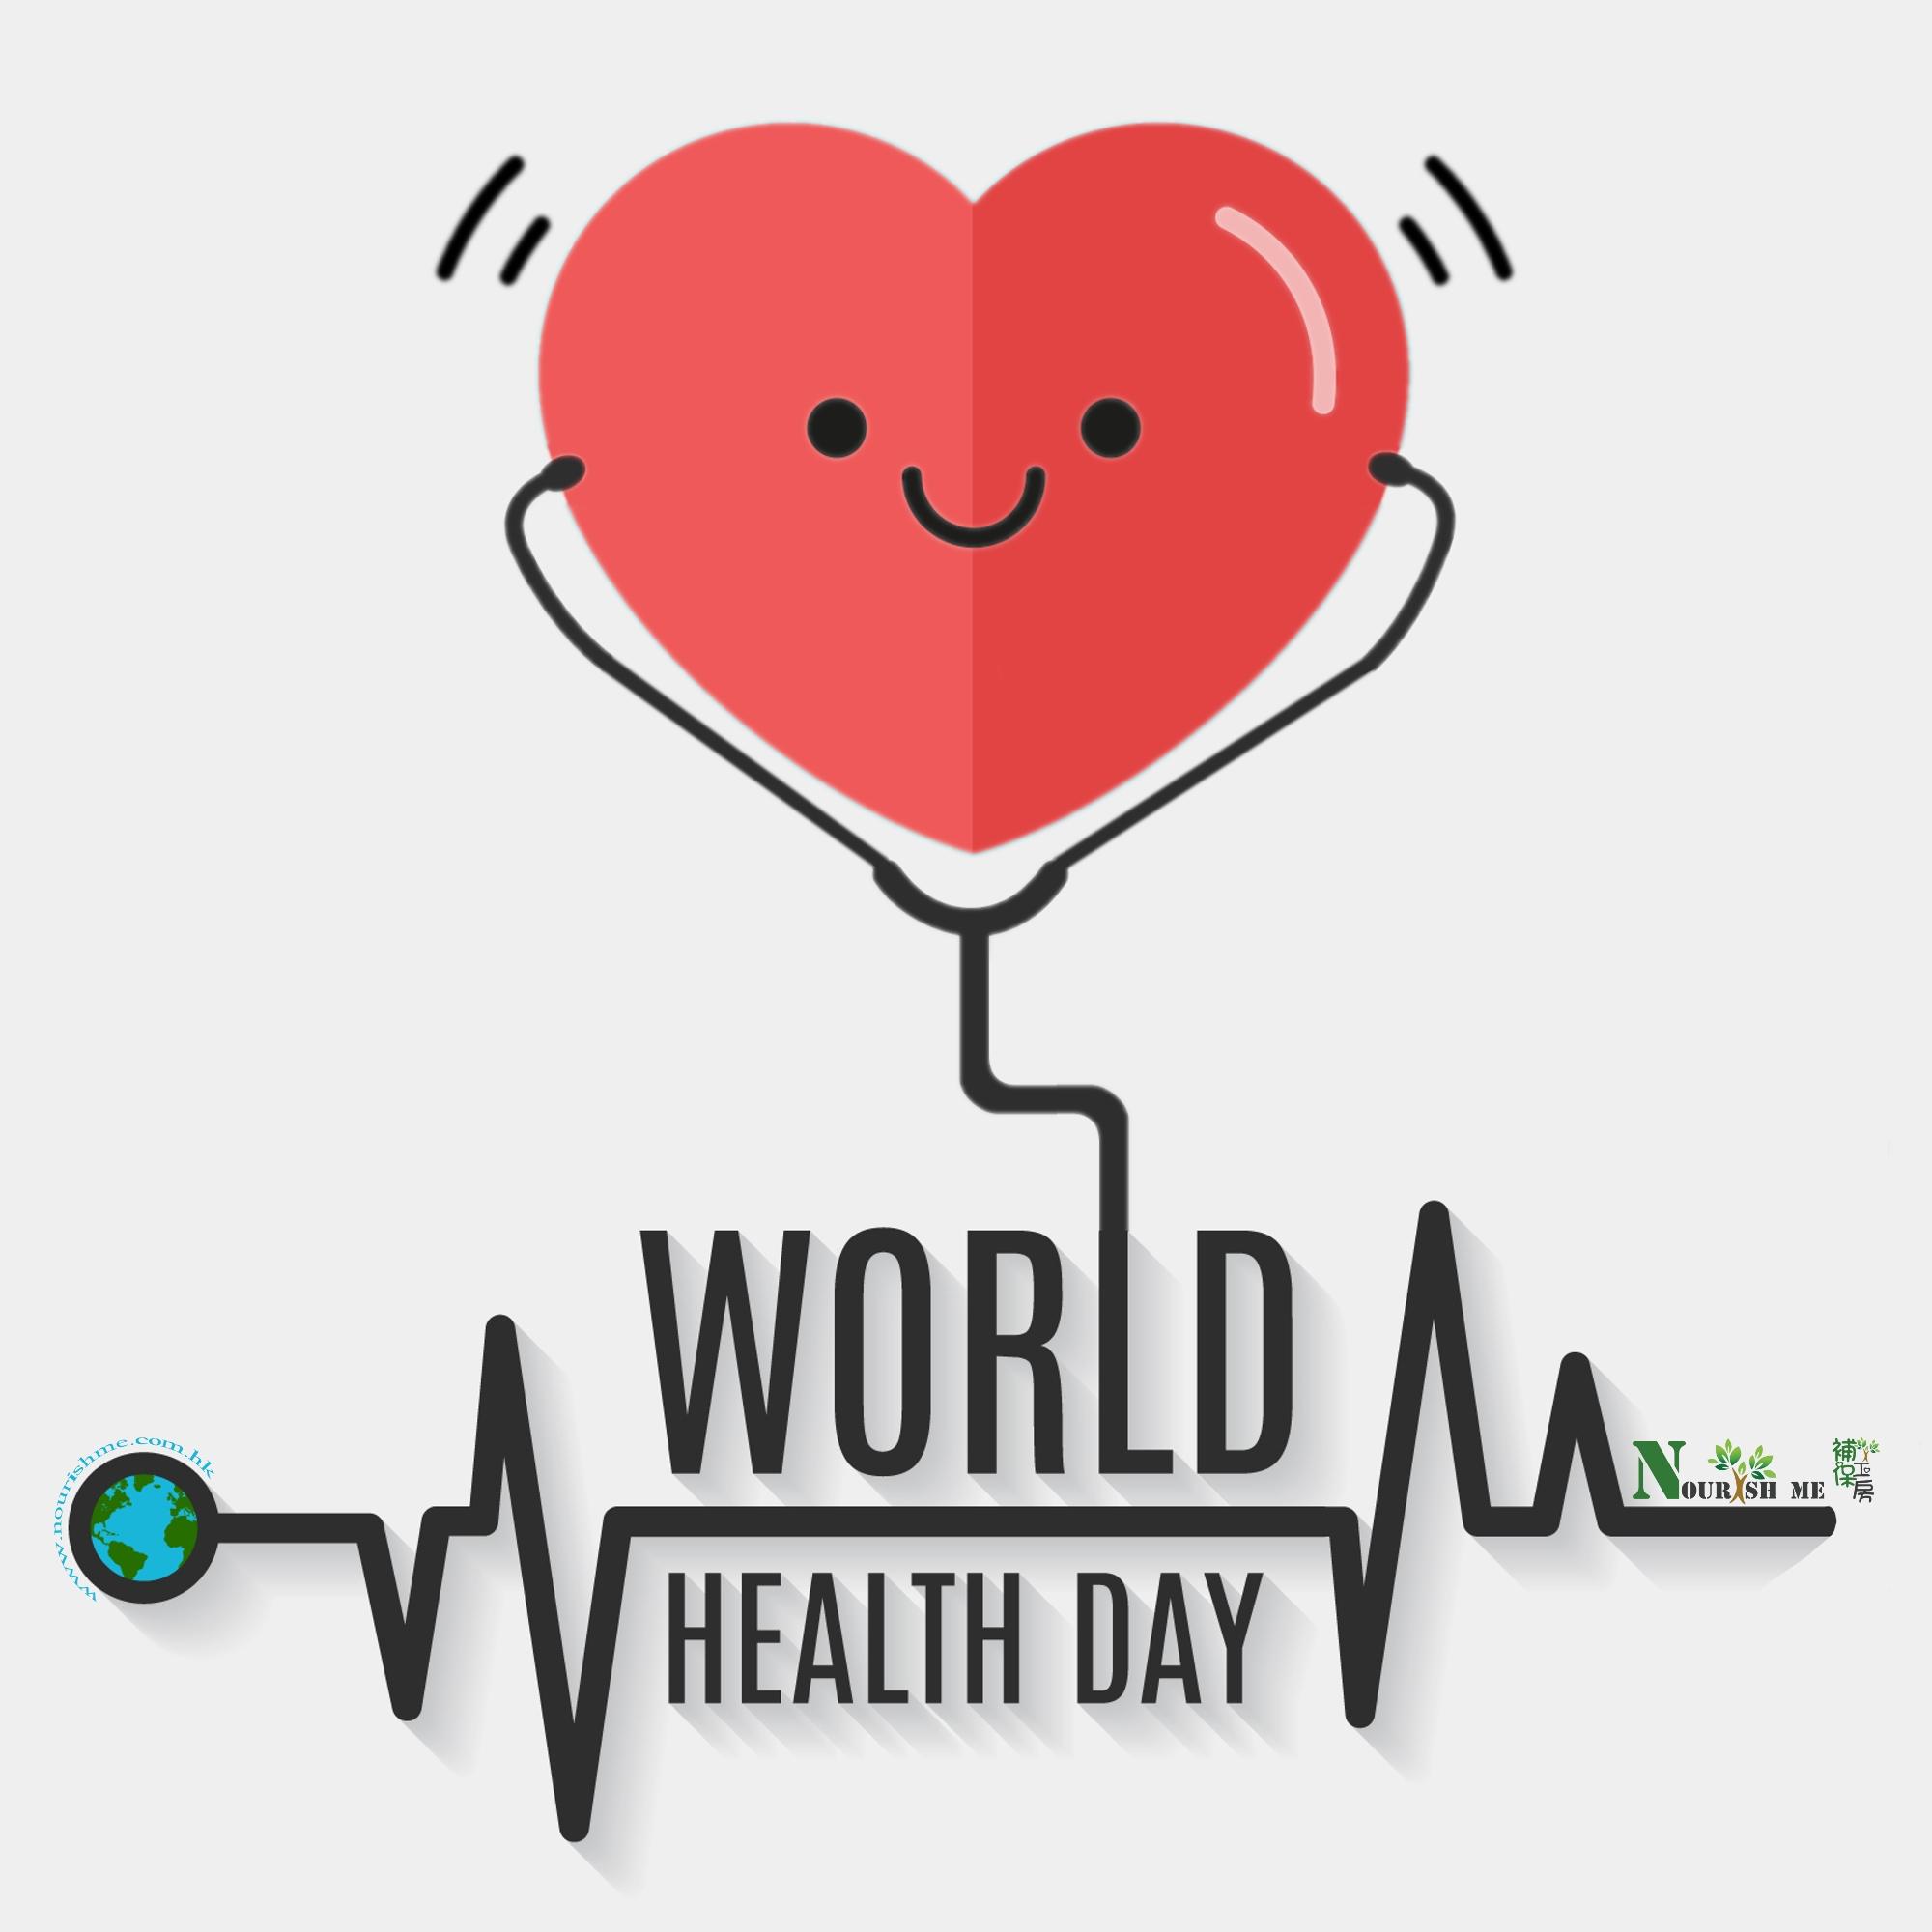 World Health Day 2018 Nourish Me